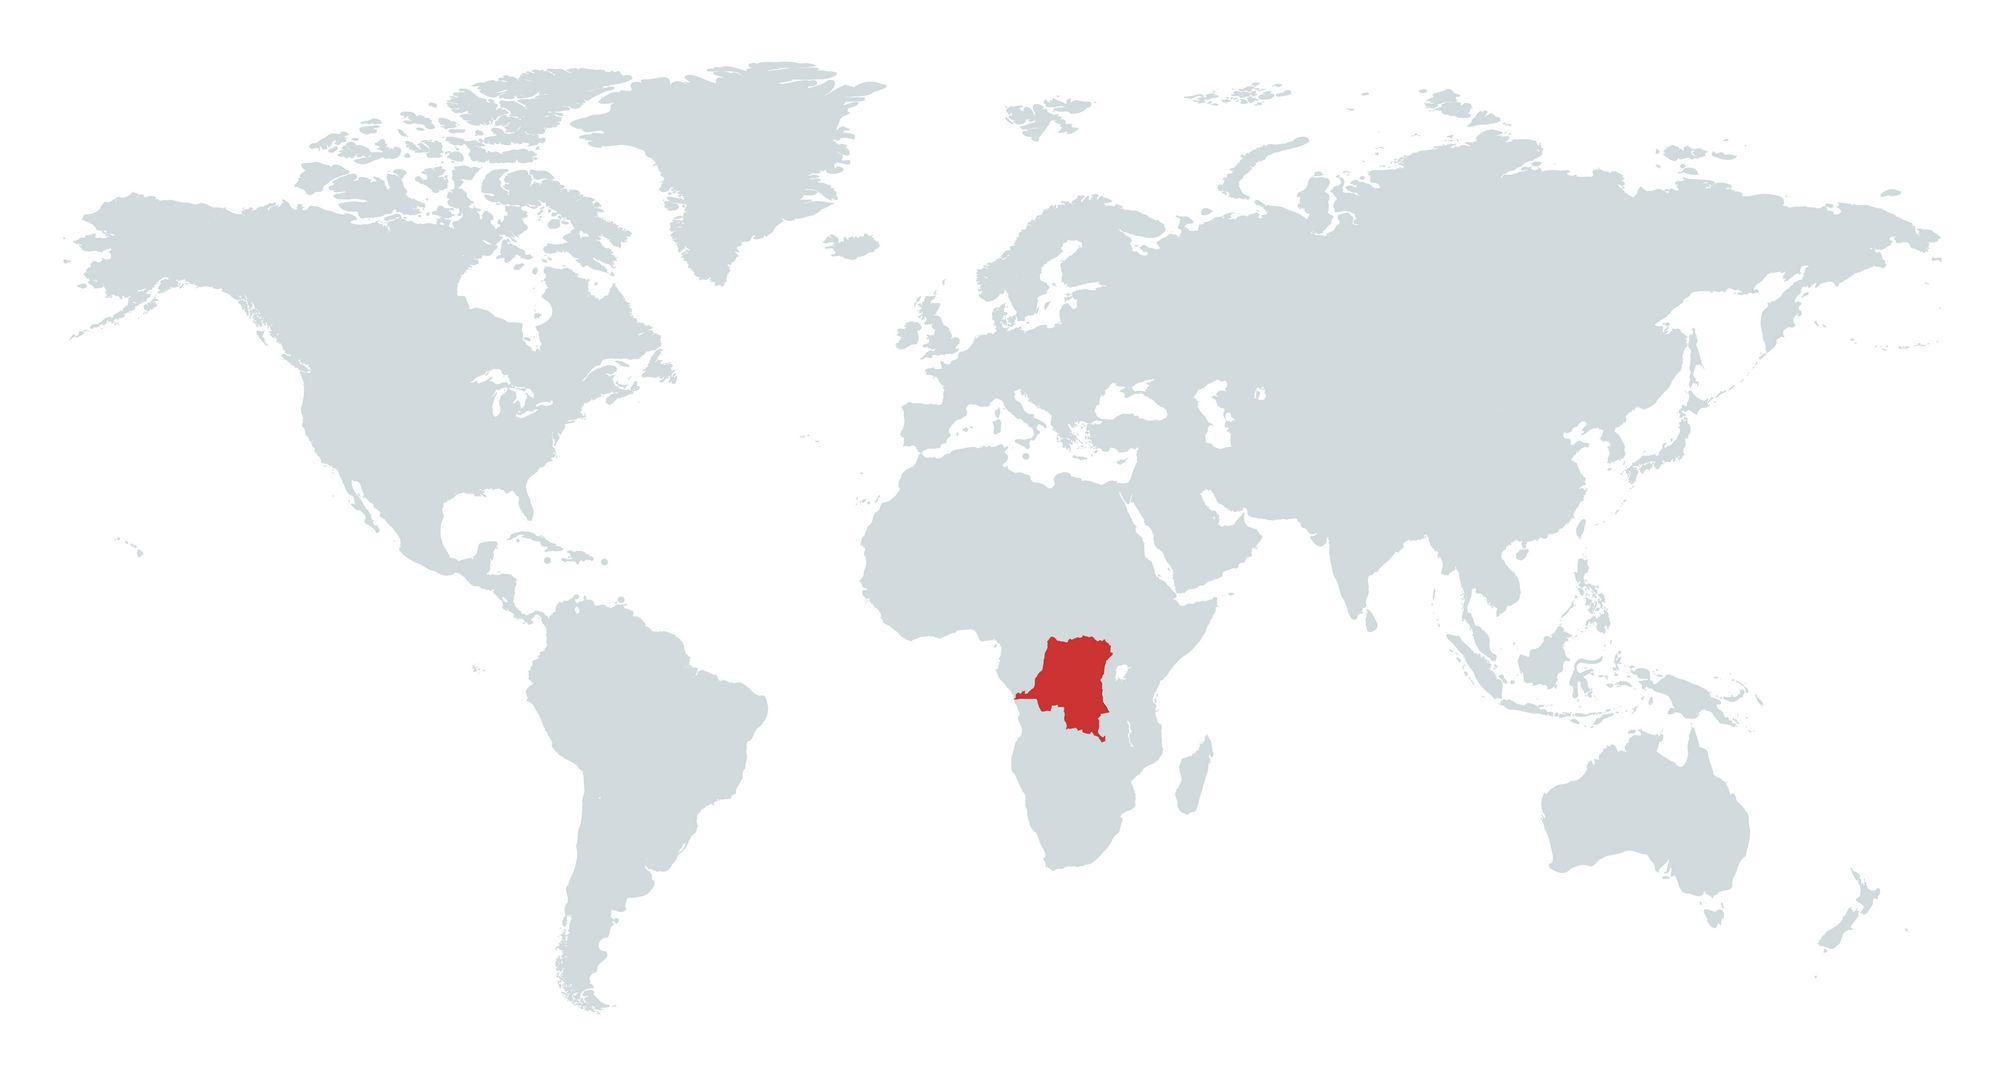 MAPA REPUBLICA DEMOCRATICA DO CONGO